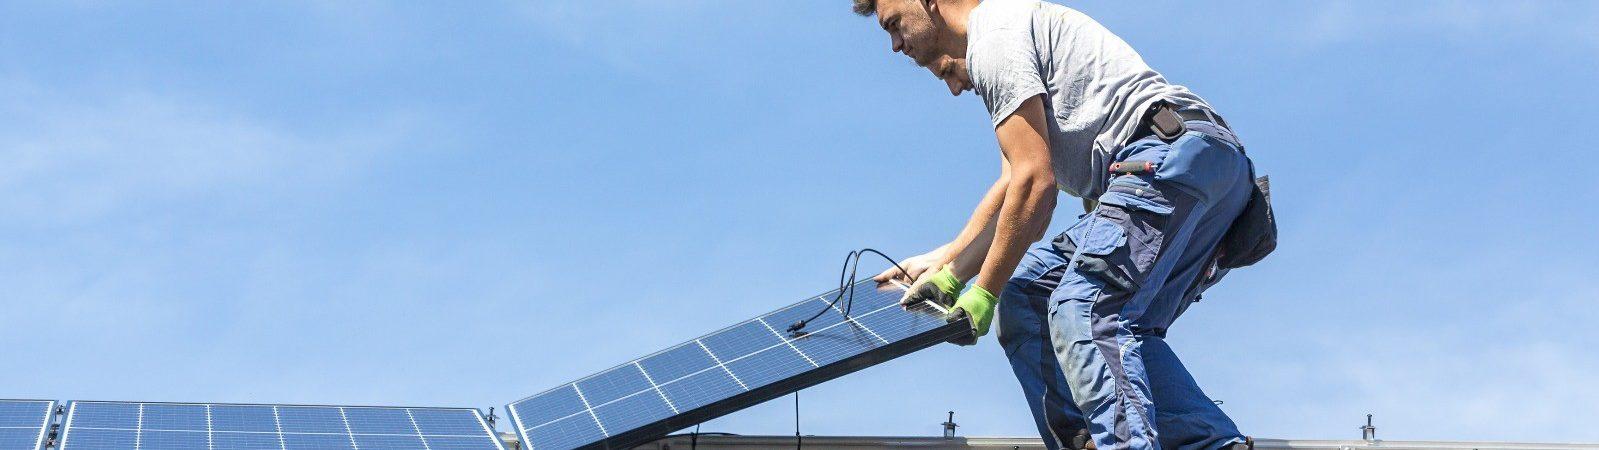 Installation eines Photovoltaik-Solarpanelsystems